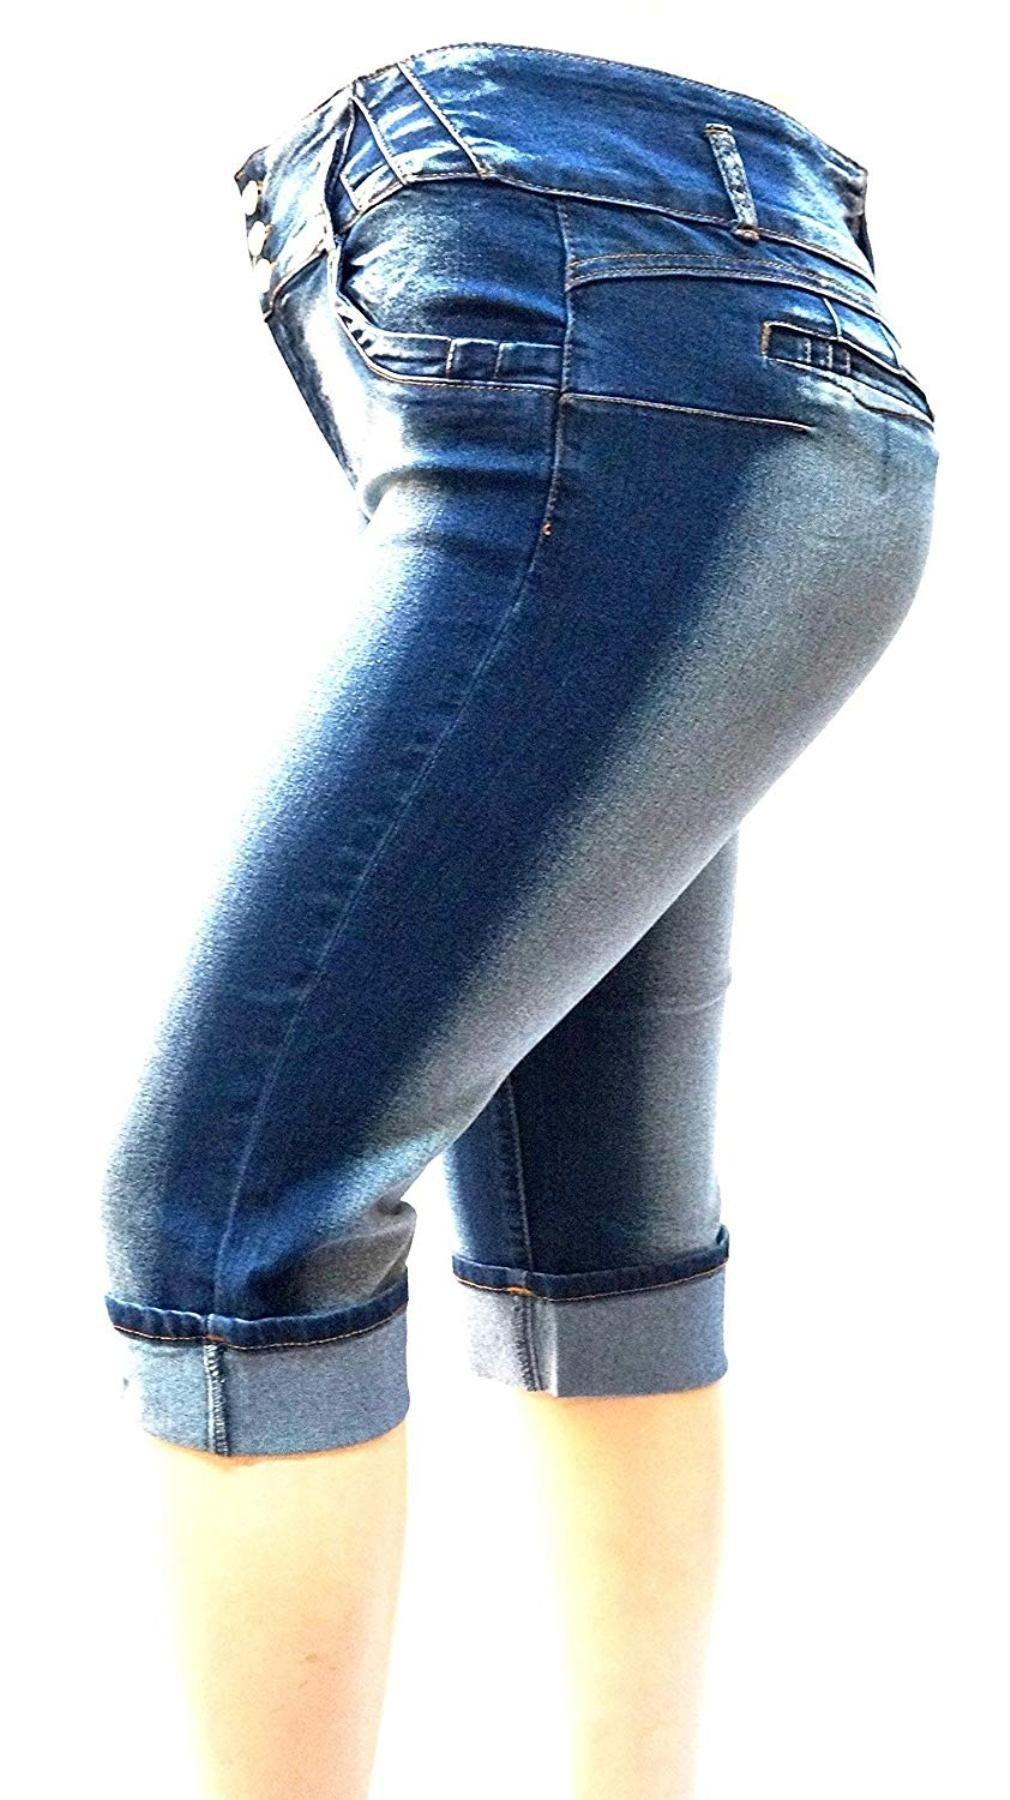 D&B Women's Plus Size Blue Denim Jeans Capri Pants Stretch HI Waist (16, DB Blue Capri 39480)